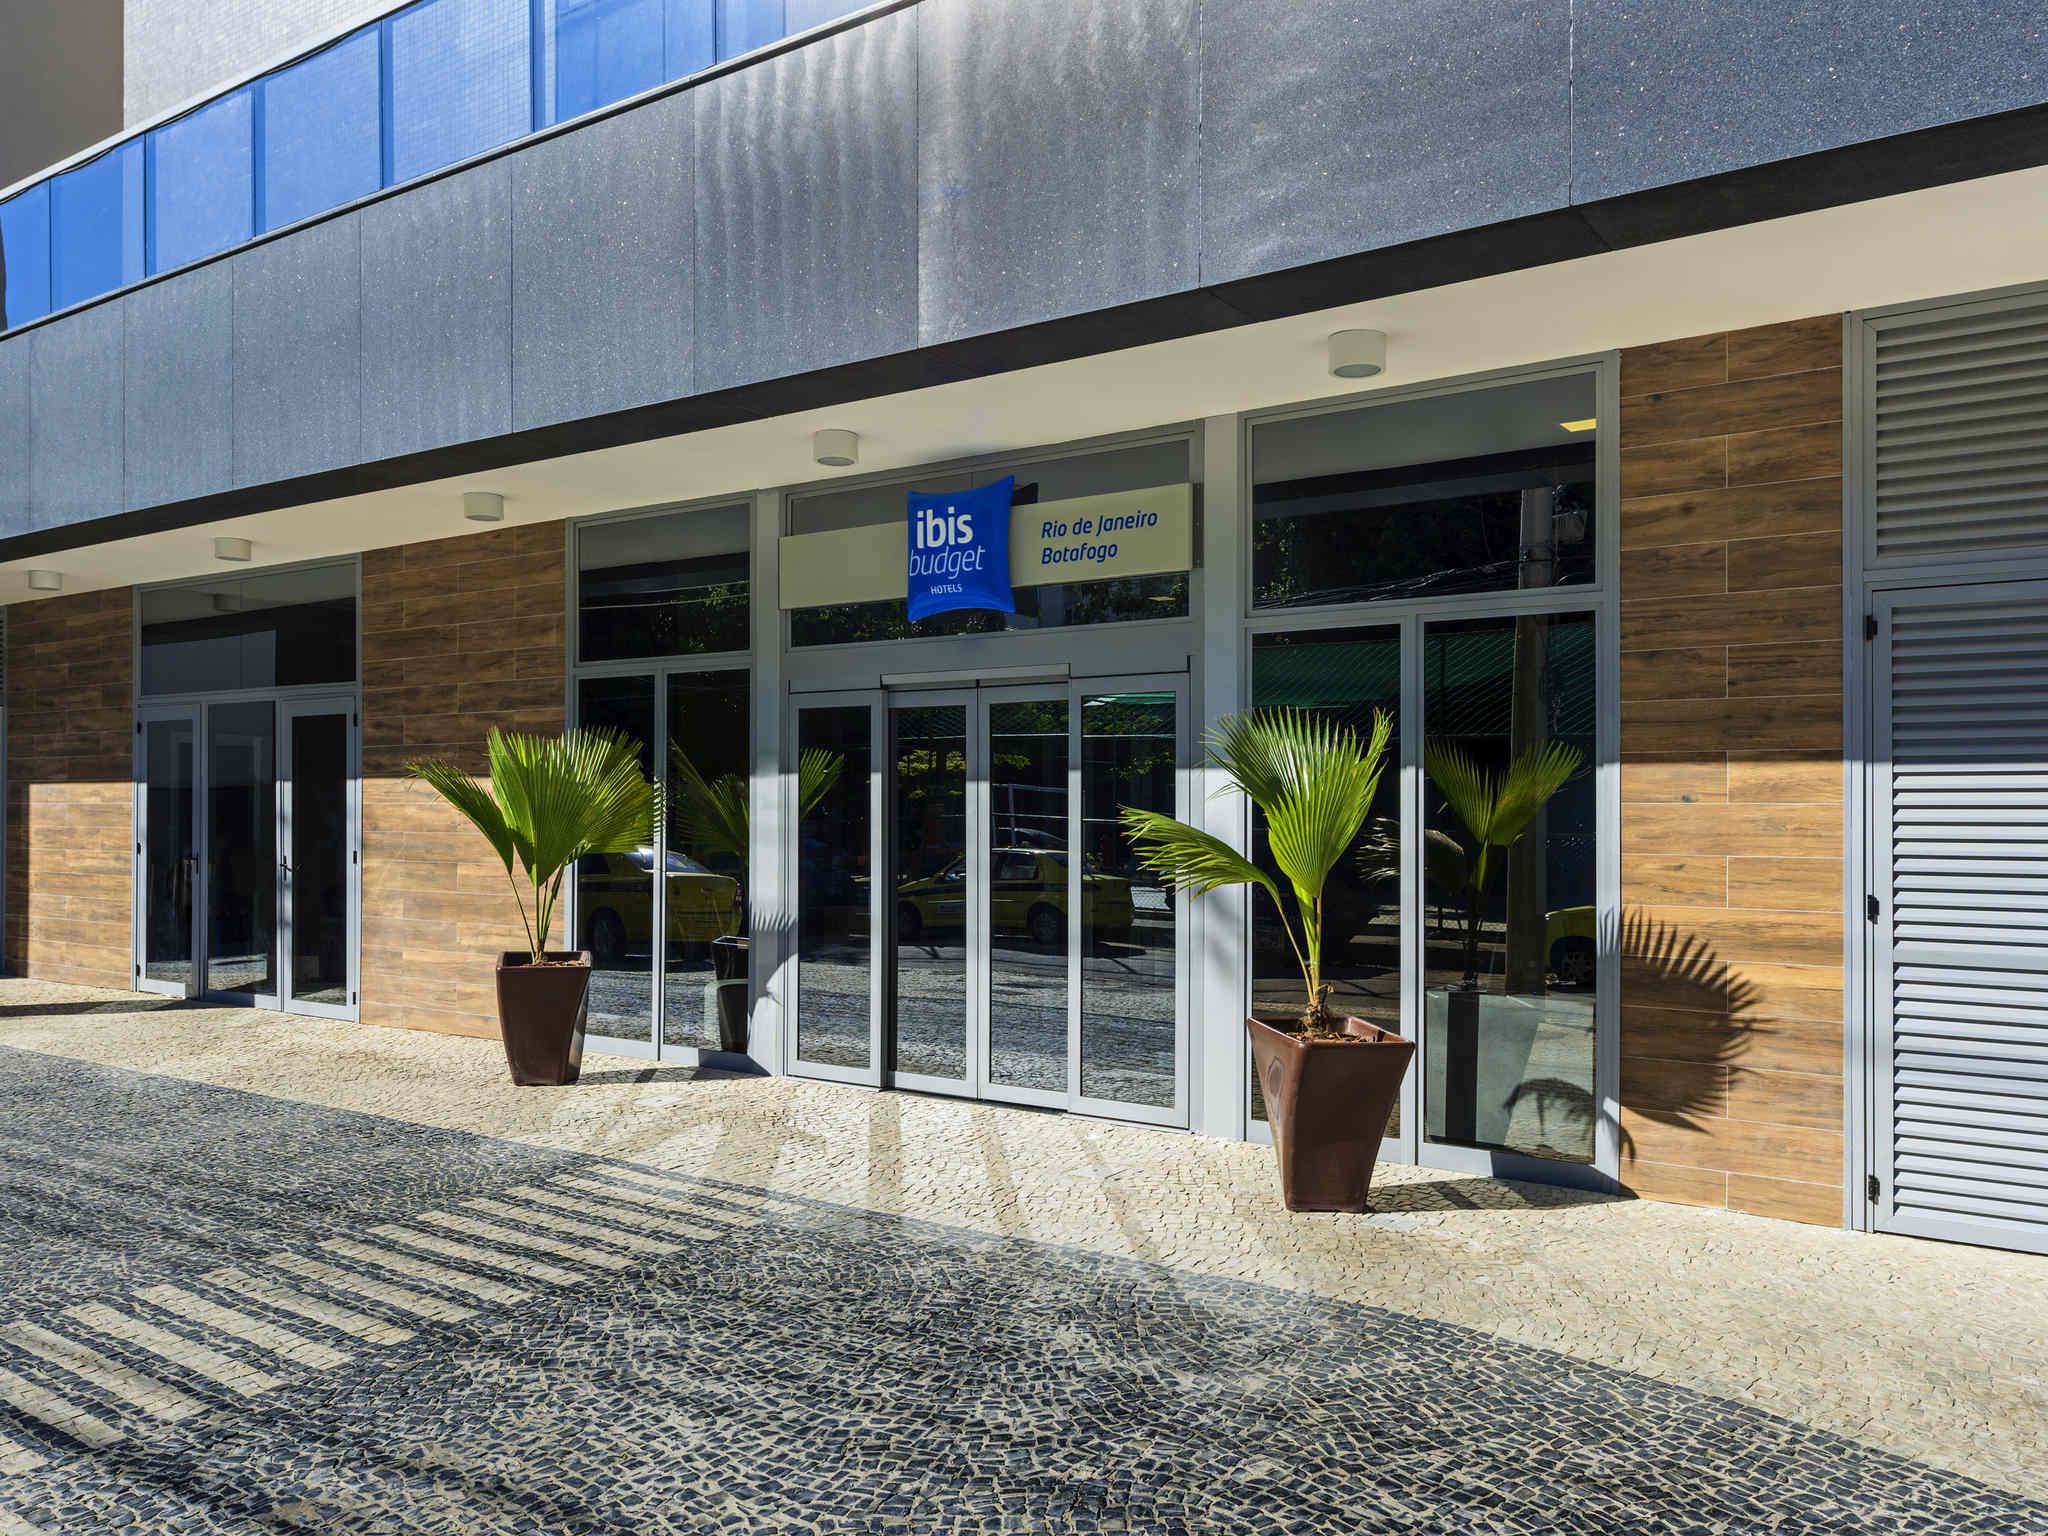 Hotel – ibis budget RJ Botafogo